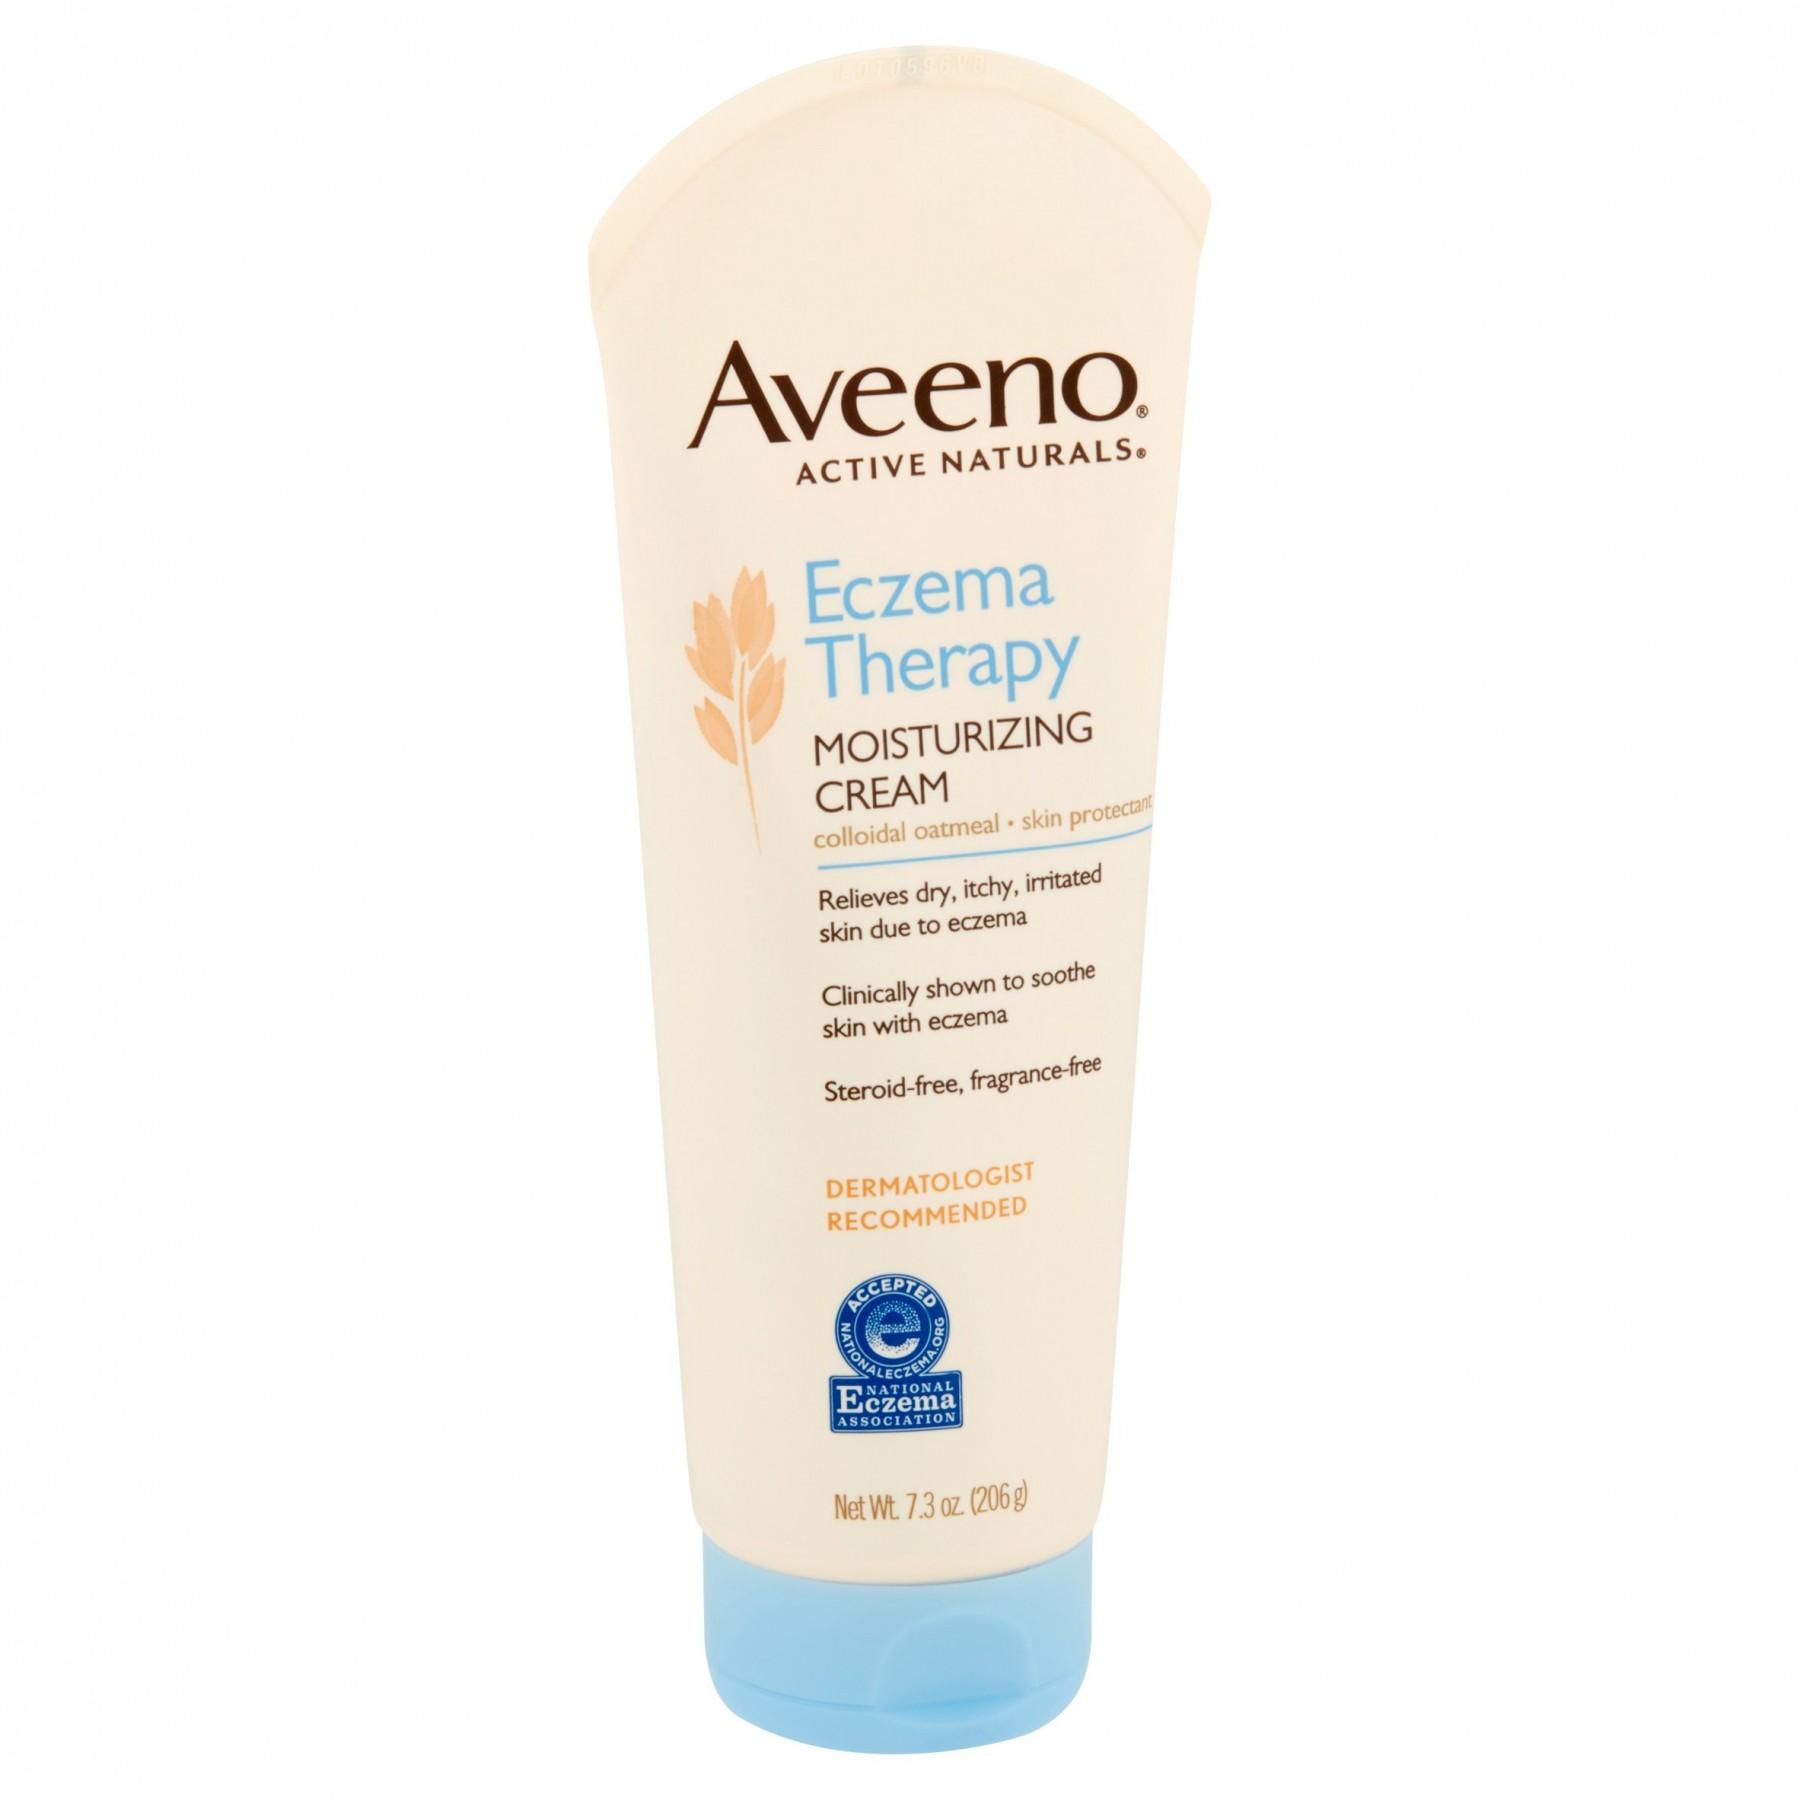 Terapia de Eczema Aveeno